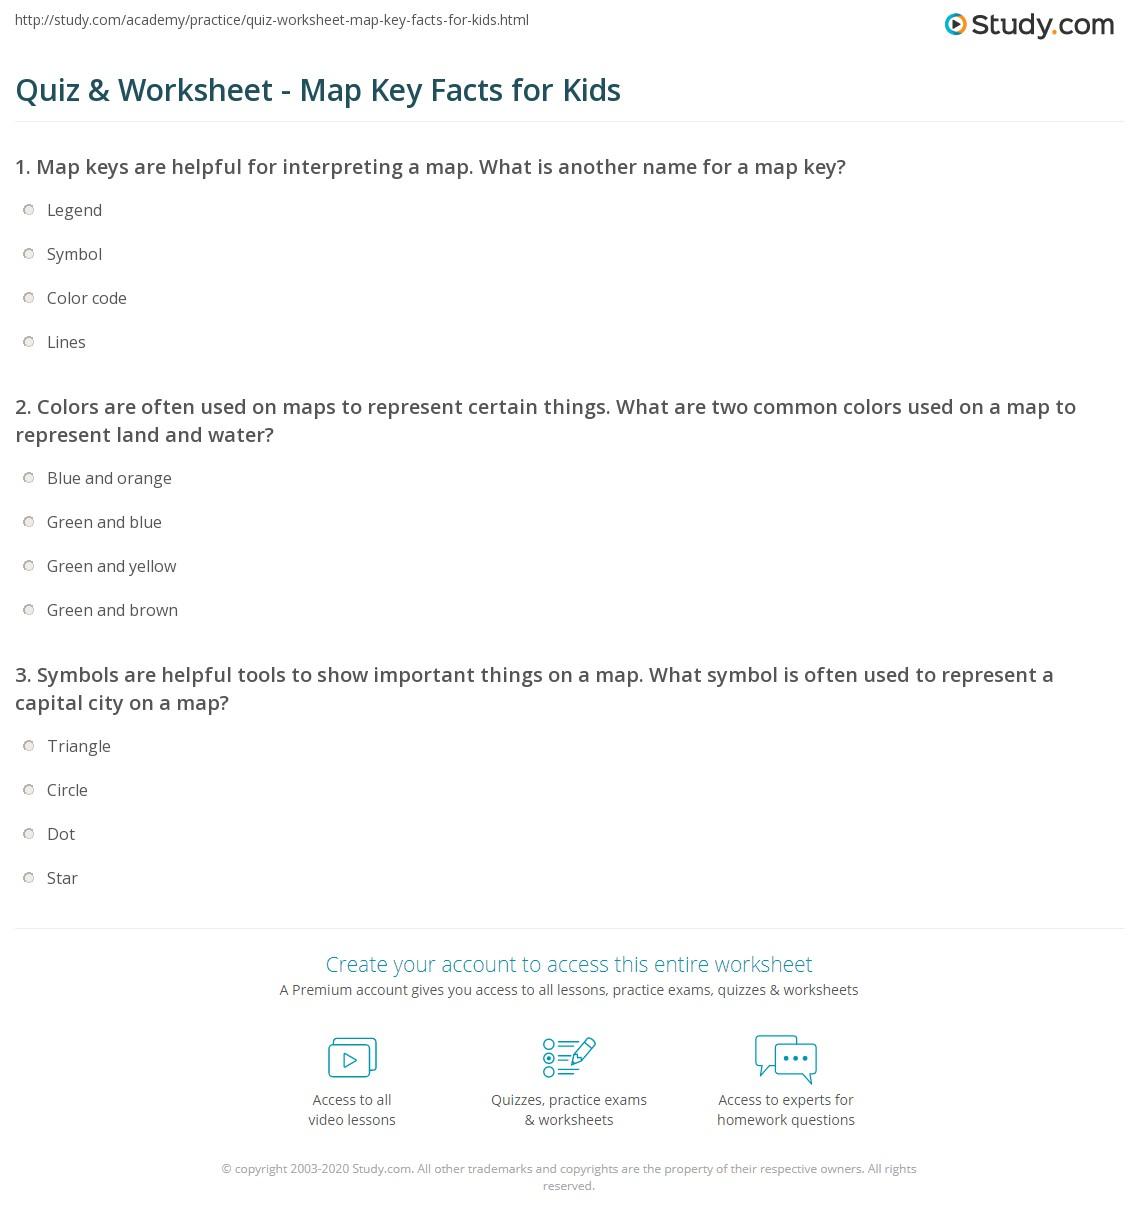 Quiz & Worksheet - Map Key Facts for Kids | Study.com